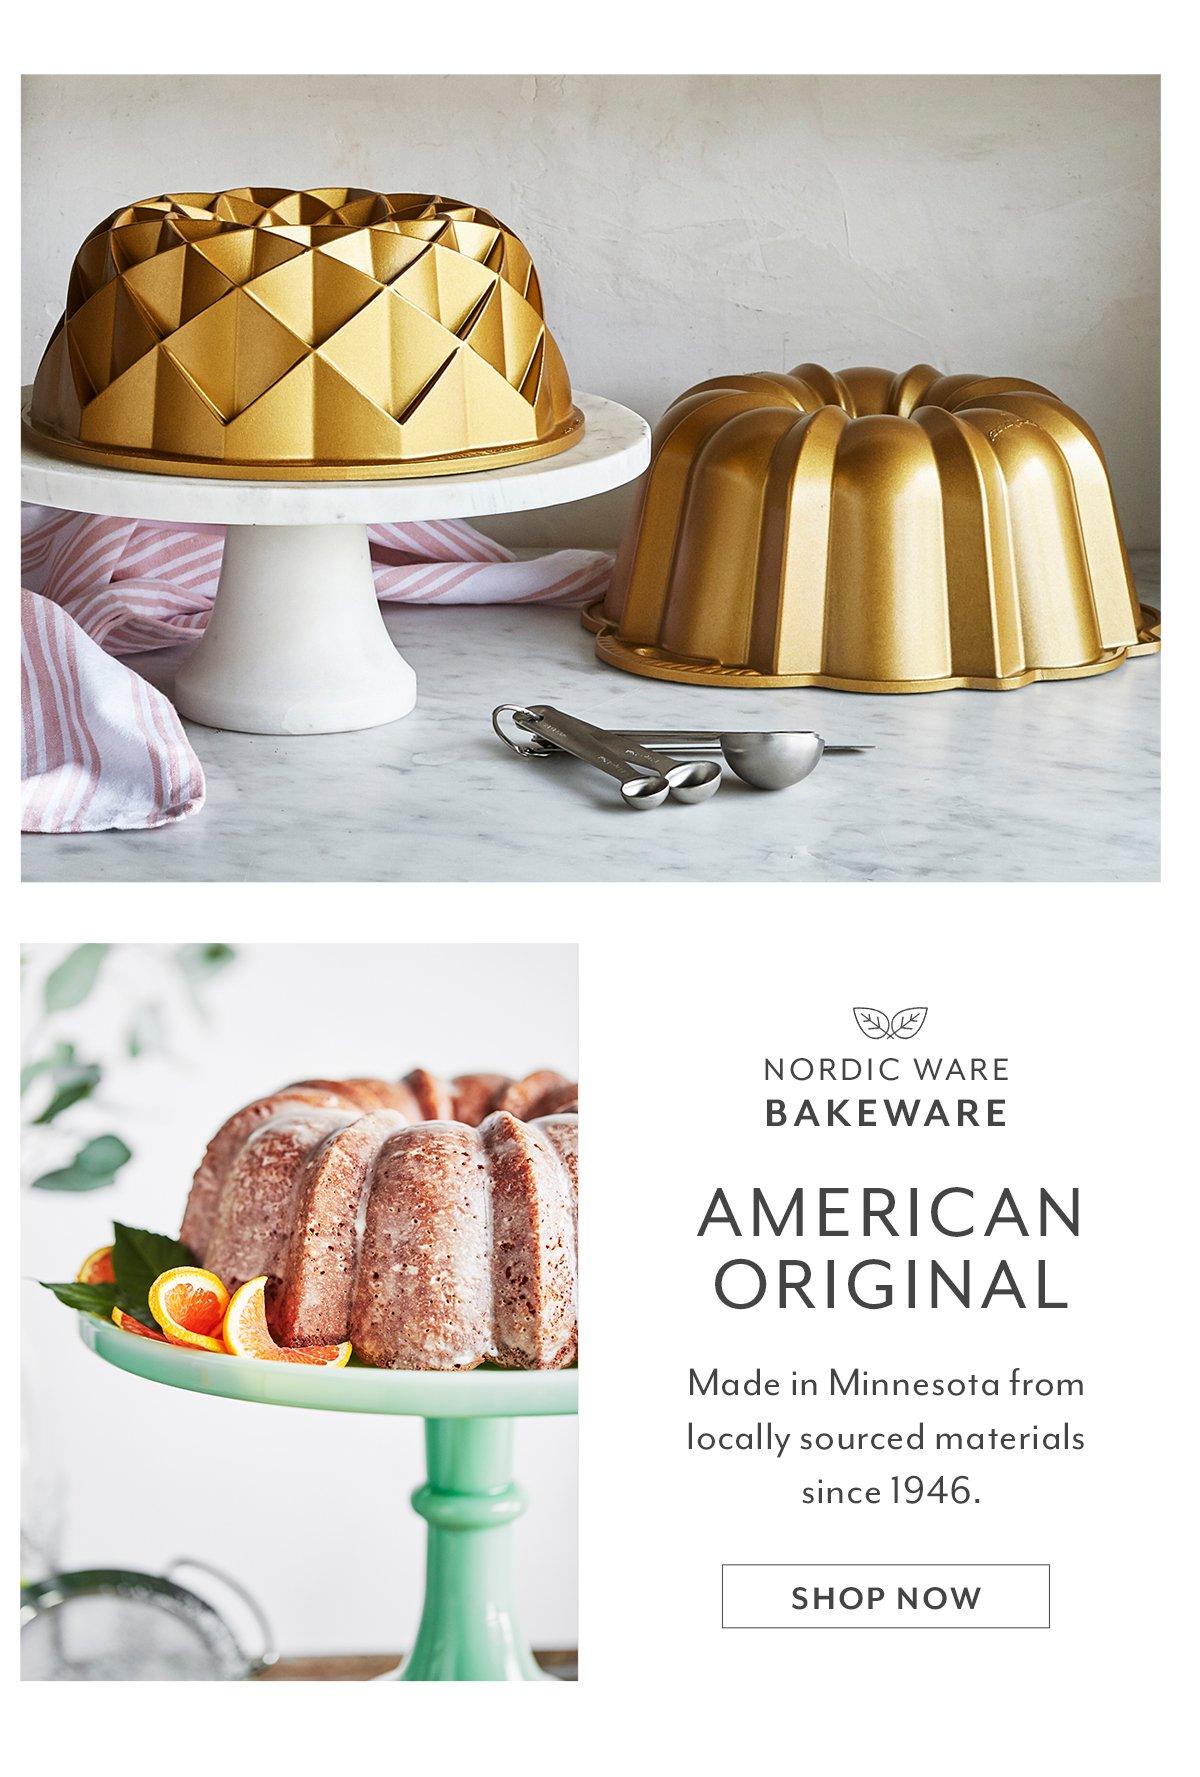 Nordic Ware Bakeware